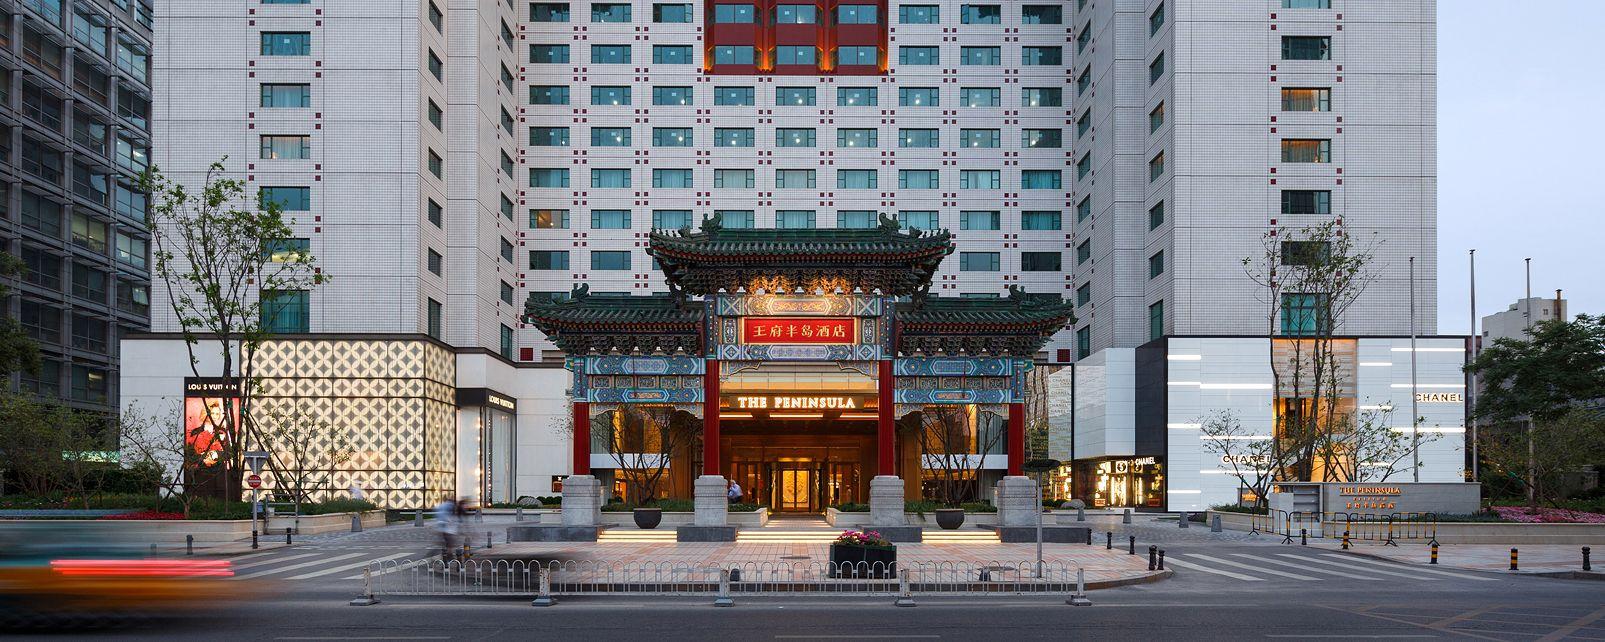 Hôtel Peninsula Palace Hotel Beijing